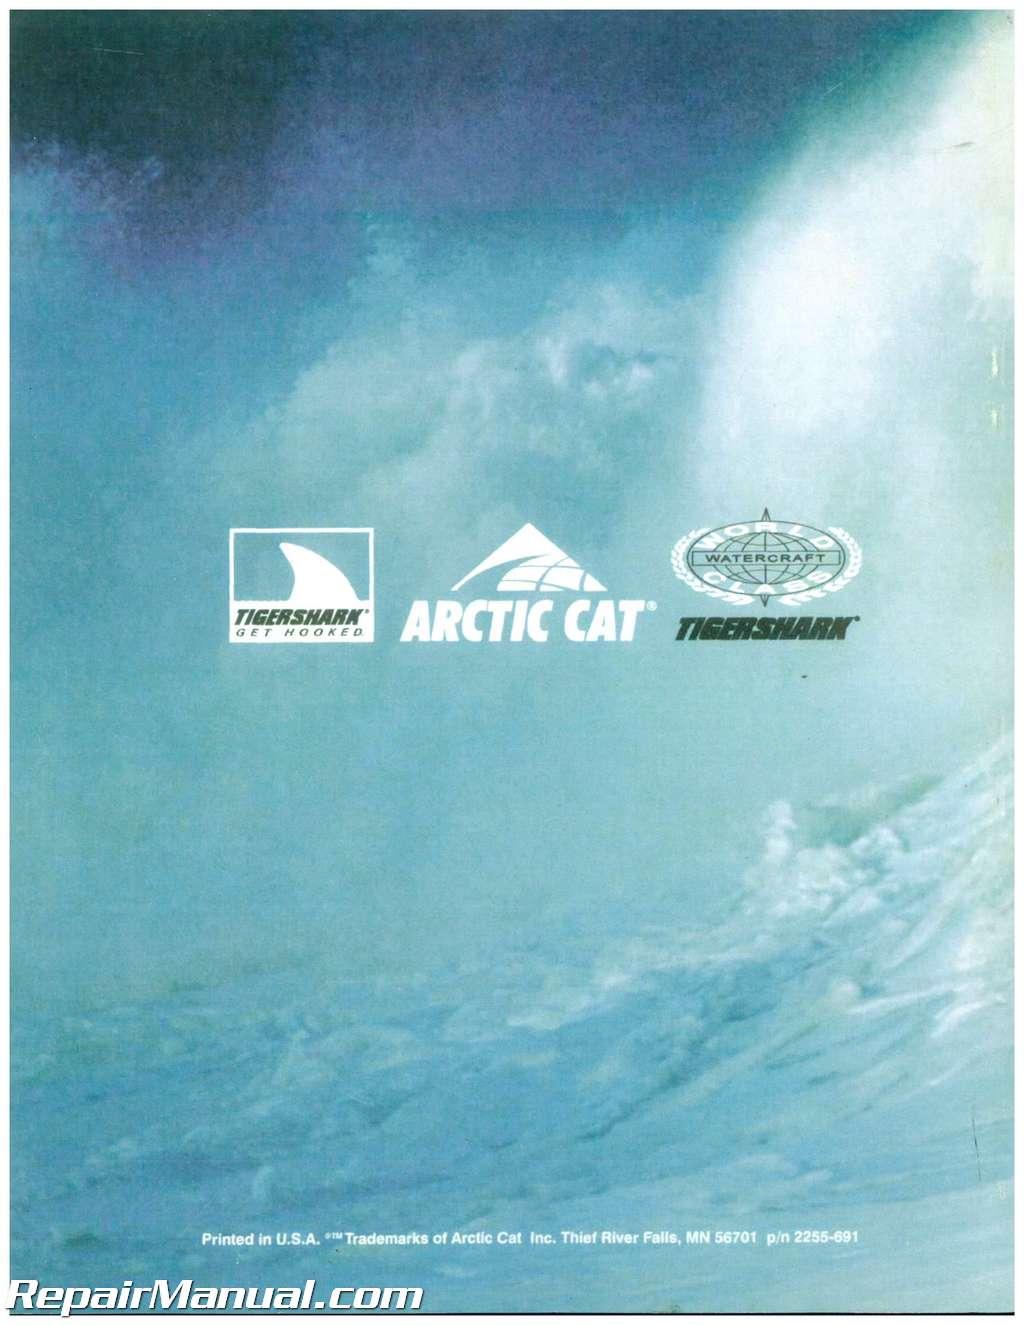 1997 tigershark monte carlo 770 1000 personal watercraft service manual rh repairmanual com Tigershark Montego 1996 Tiger Shark Monte Carlo